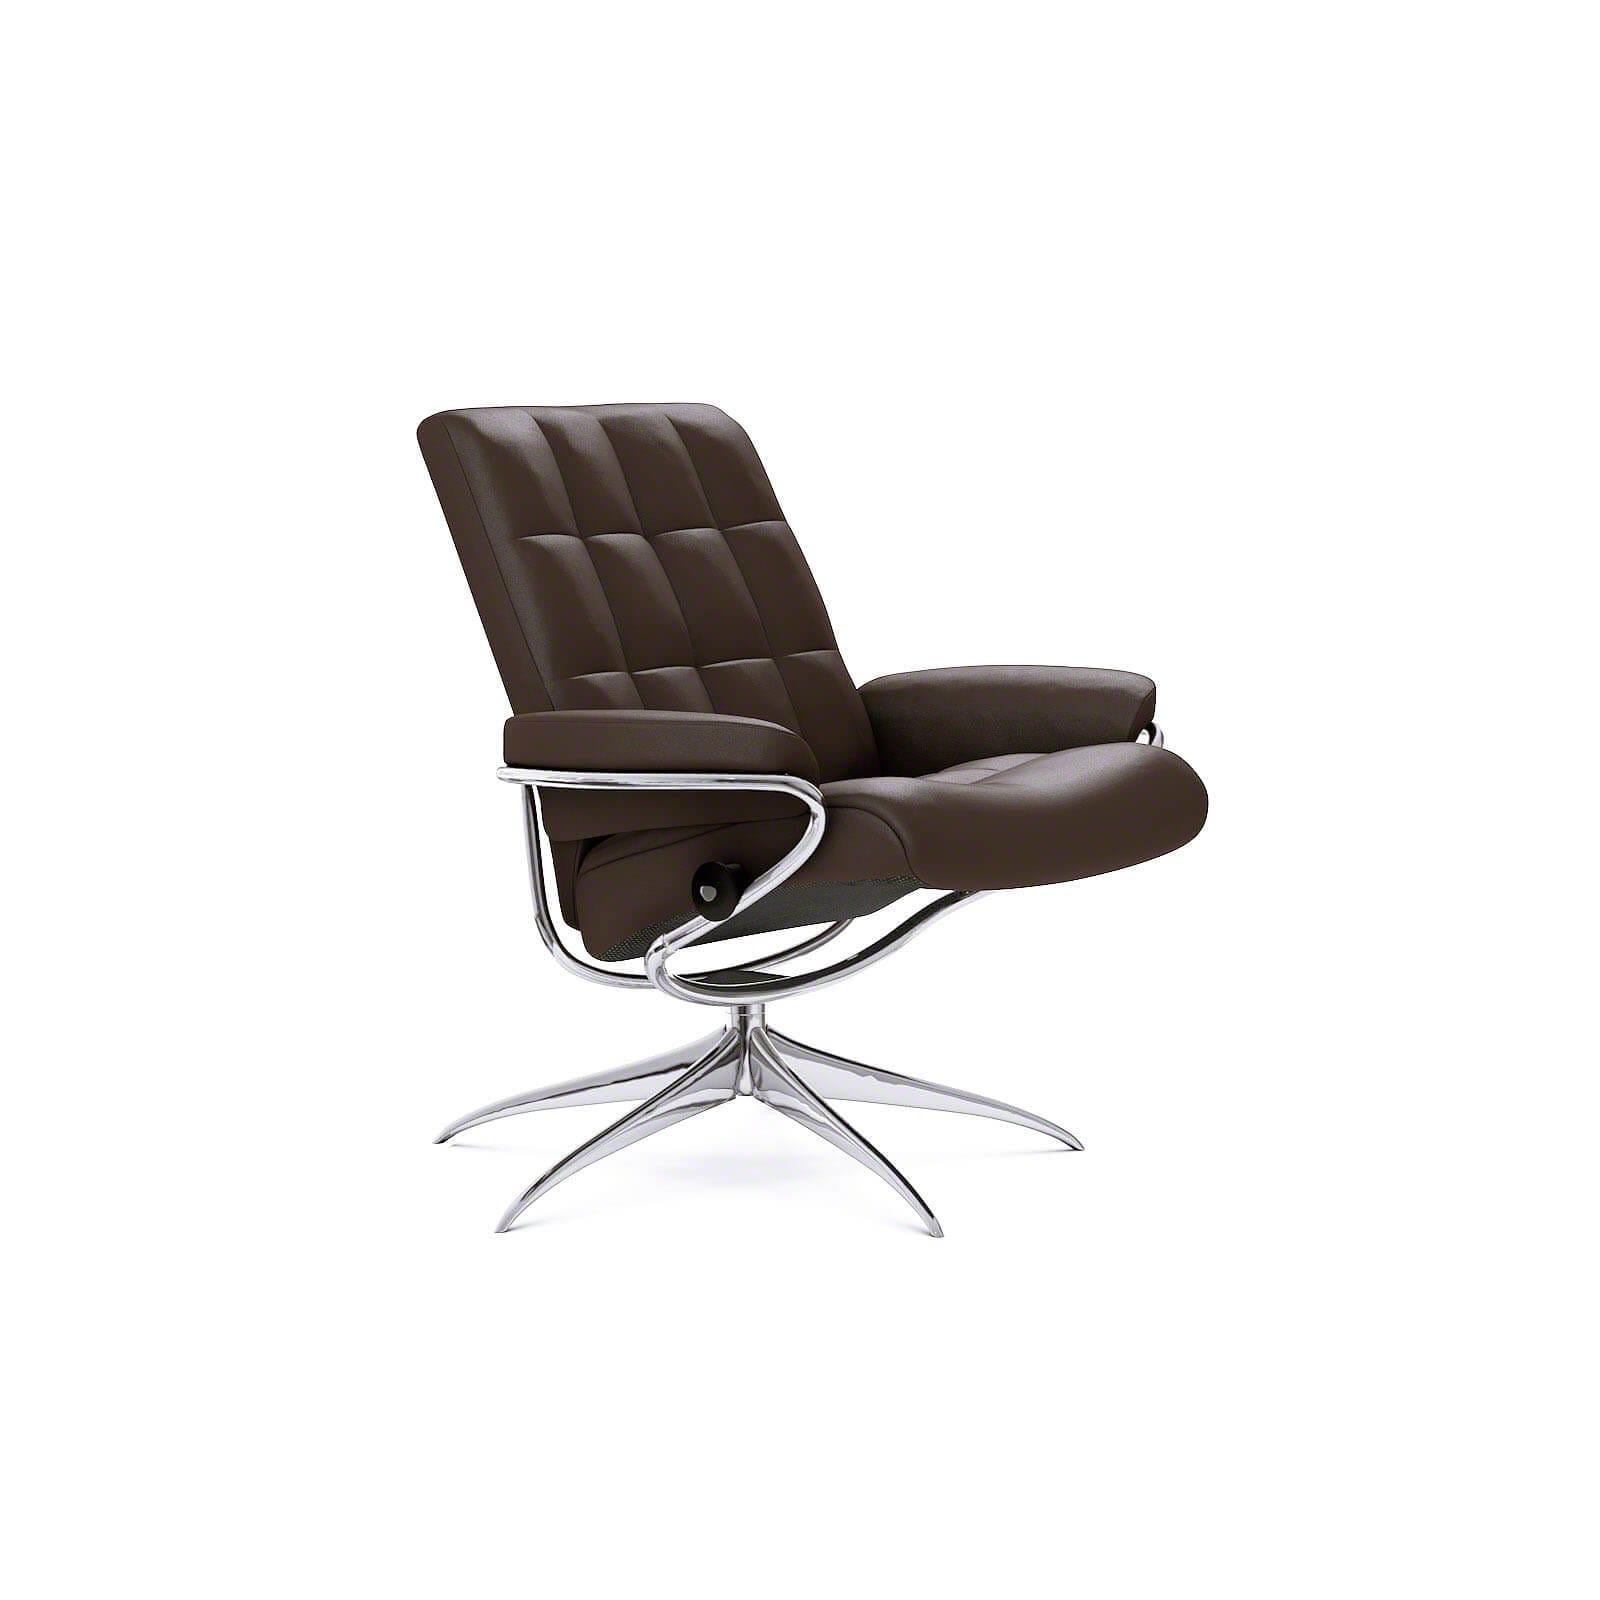 stressless london sessel niedrige lehne paloma chestnut stressless. Black Bedroom Furniture Sets. Home Design Ideas